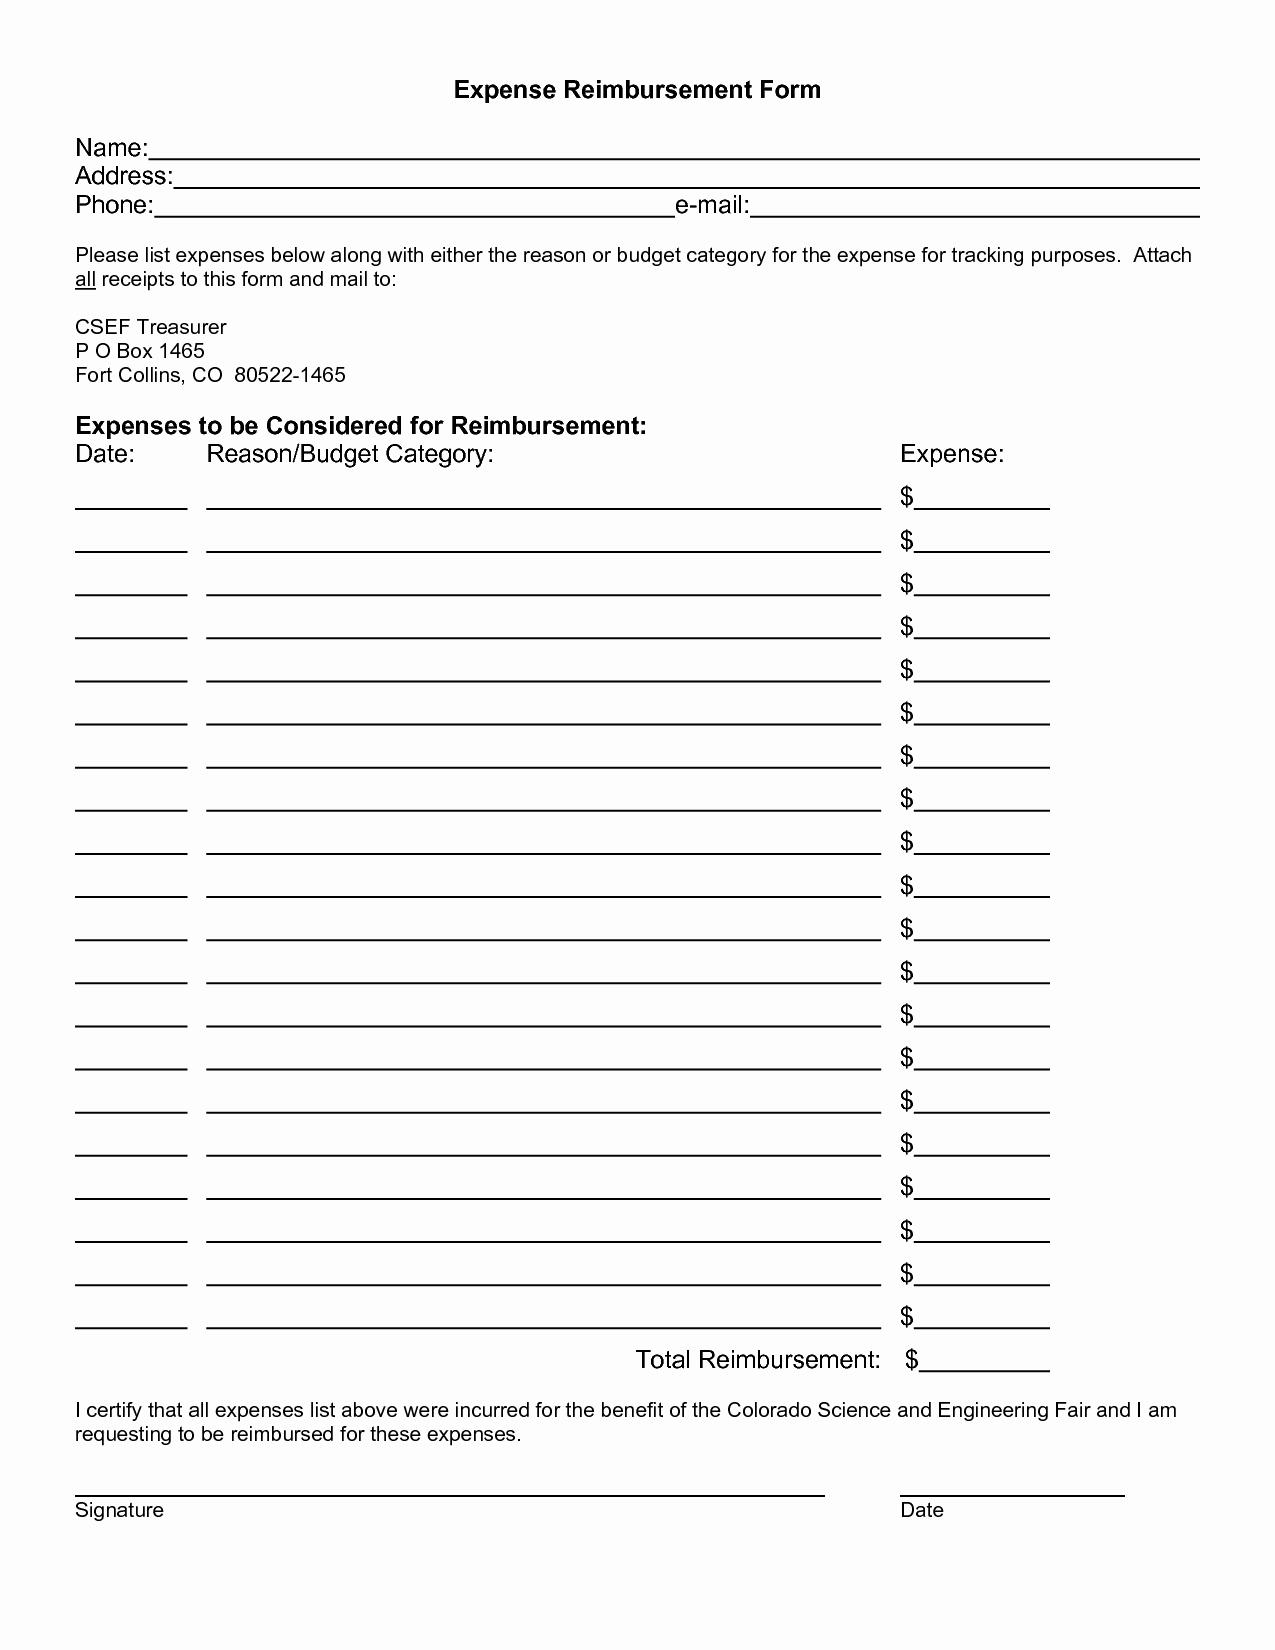 Travel Request form Template Excel Inspirational Sample Expense Reimbursement form Portablegasgrillweber